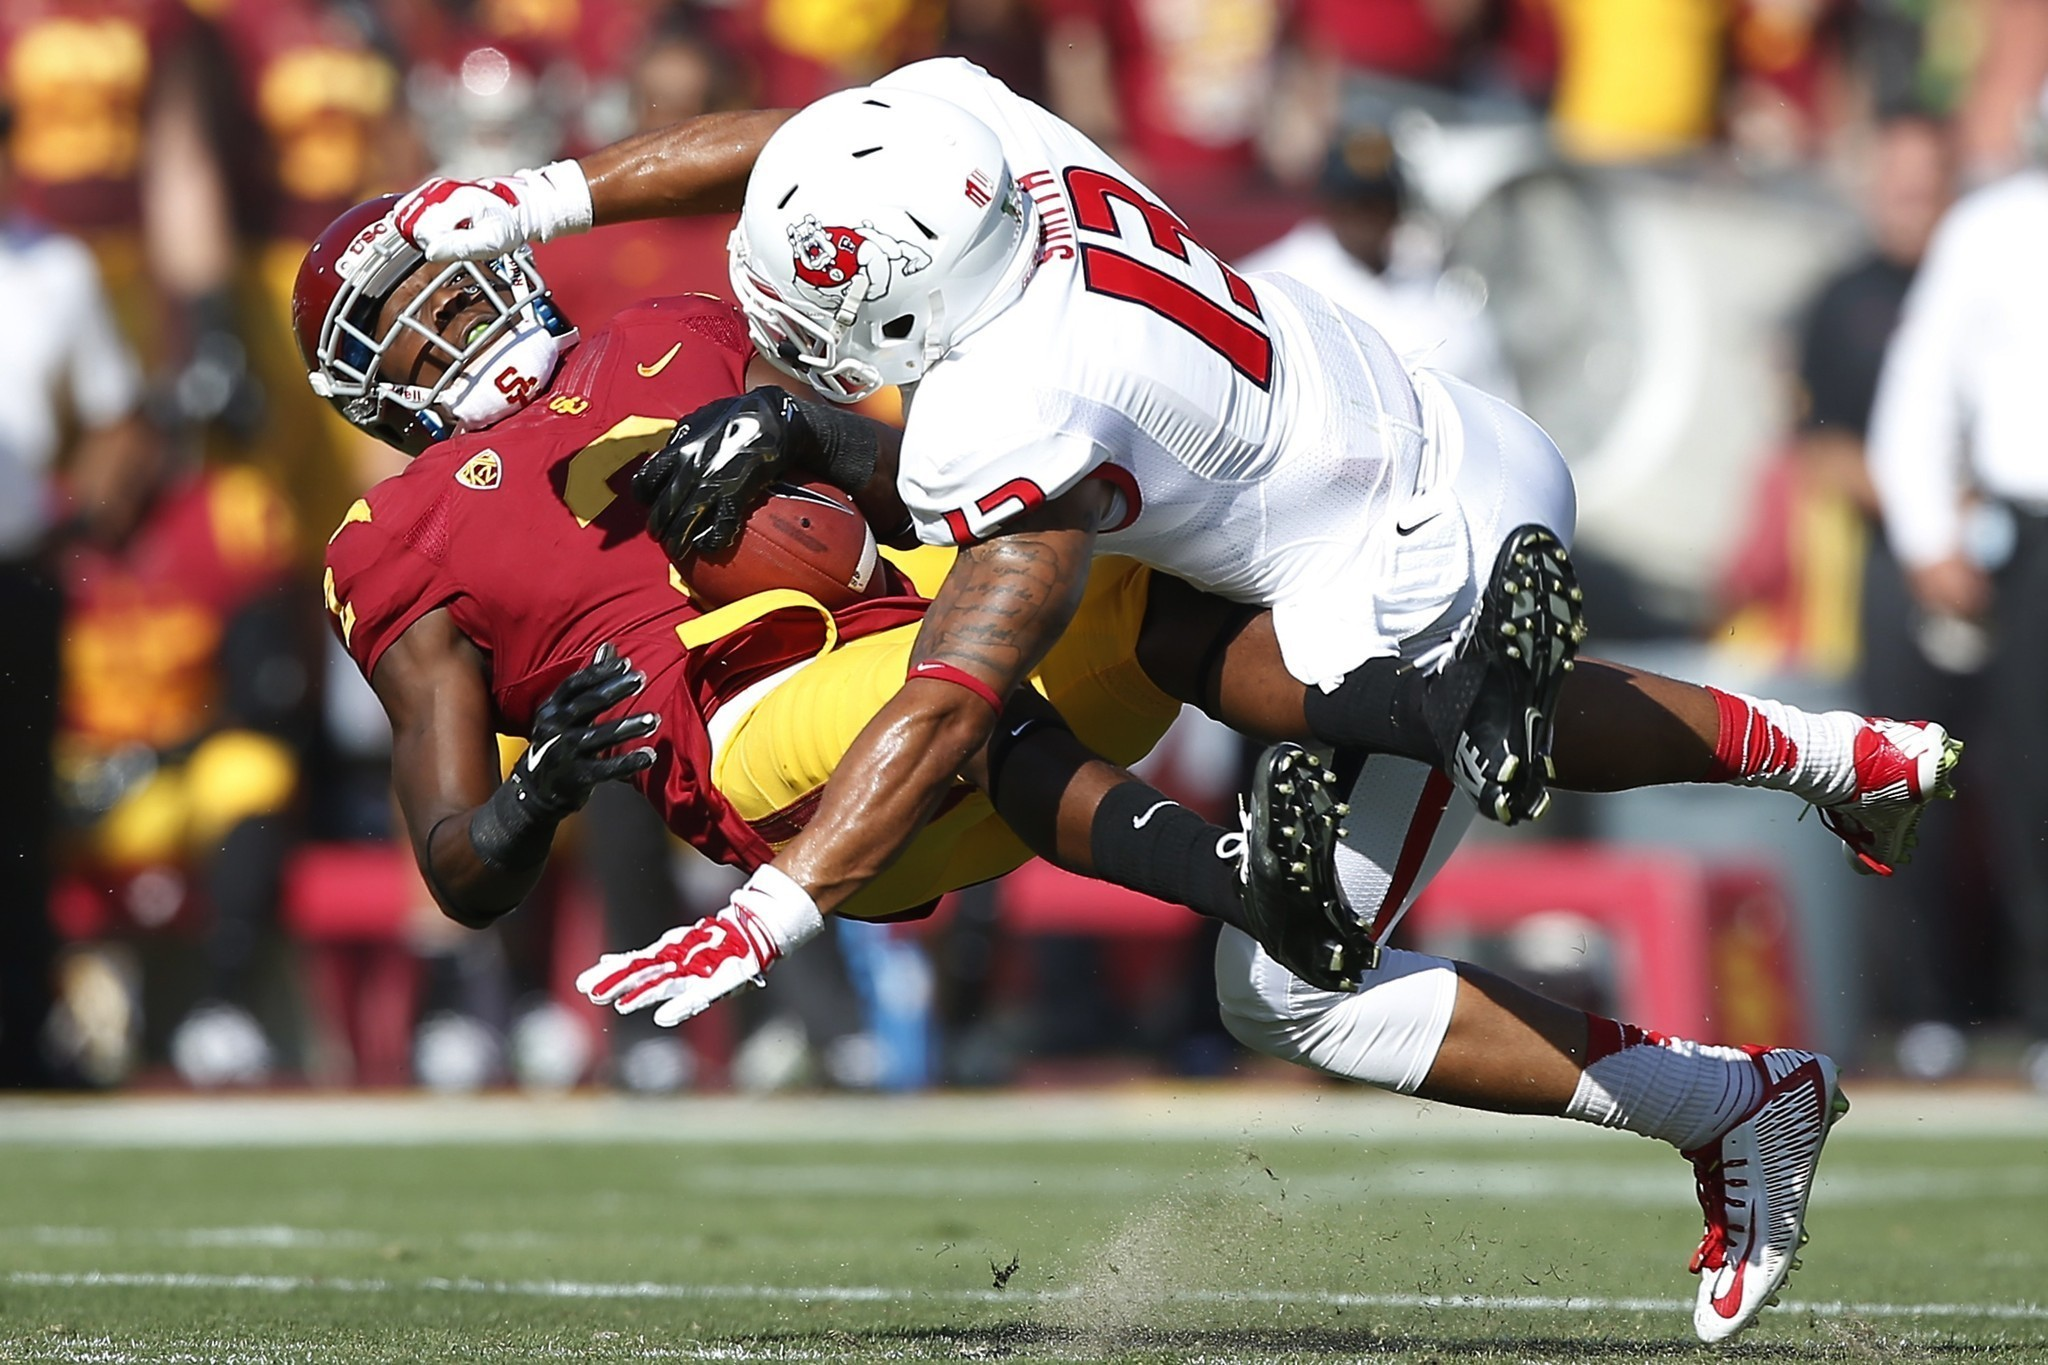 Focused Trojans romp past Fresno State in opener, 52-13